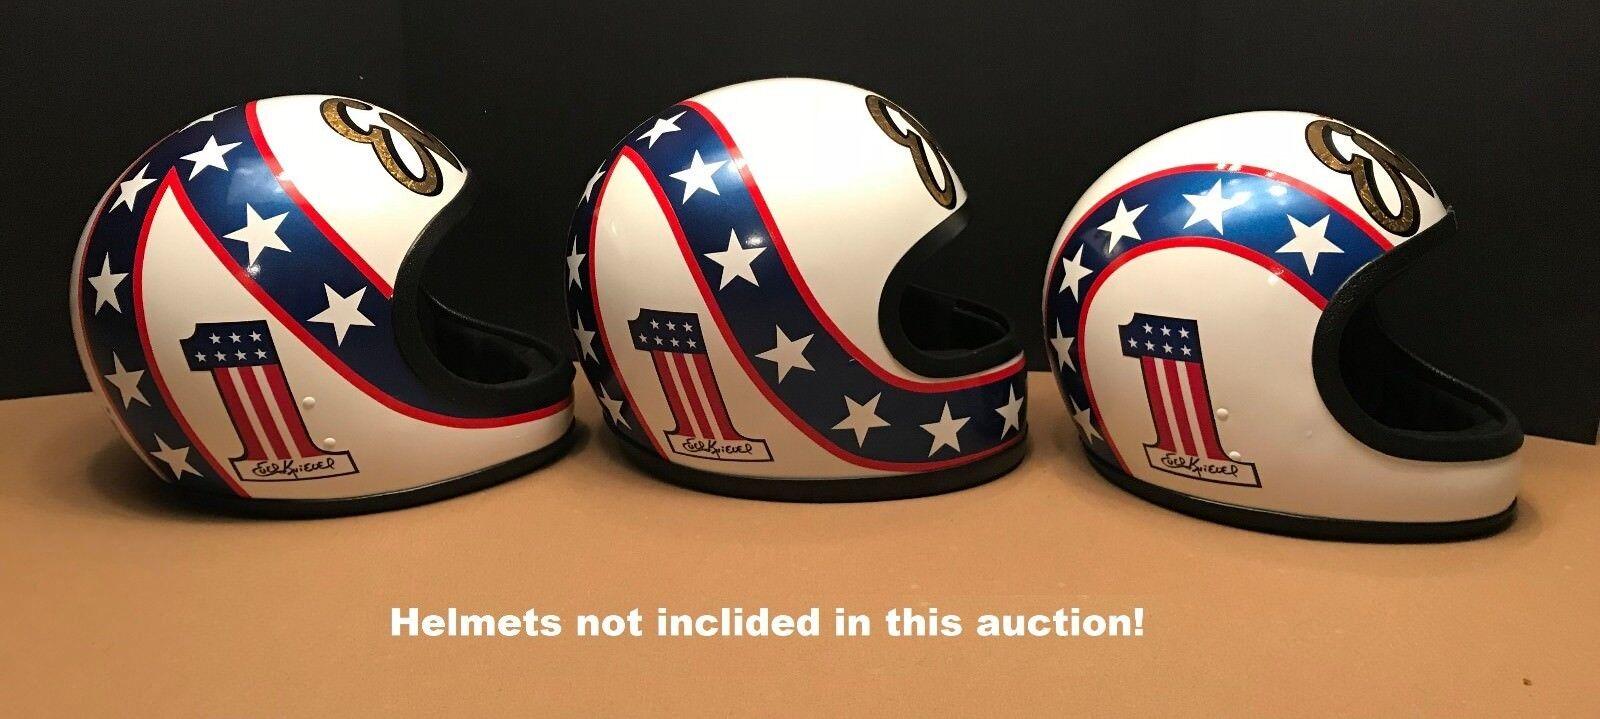 Evel knievel make your own helmet vinyl decal set 1 daredevil polybull com